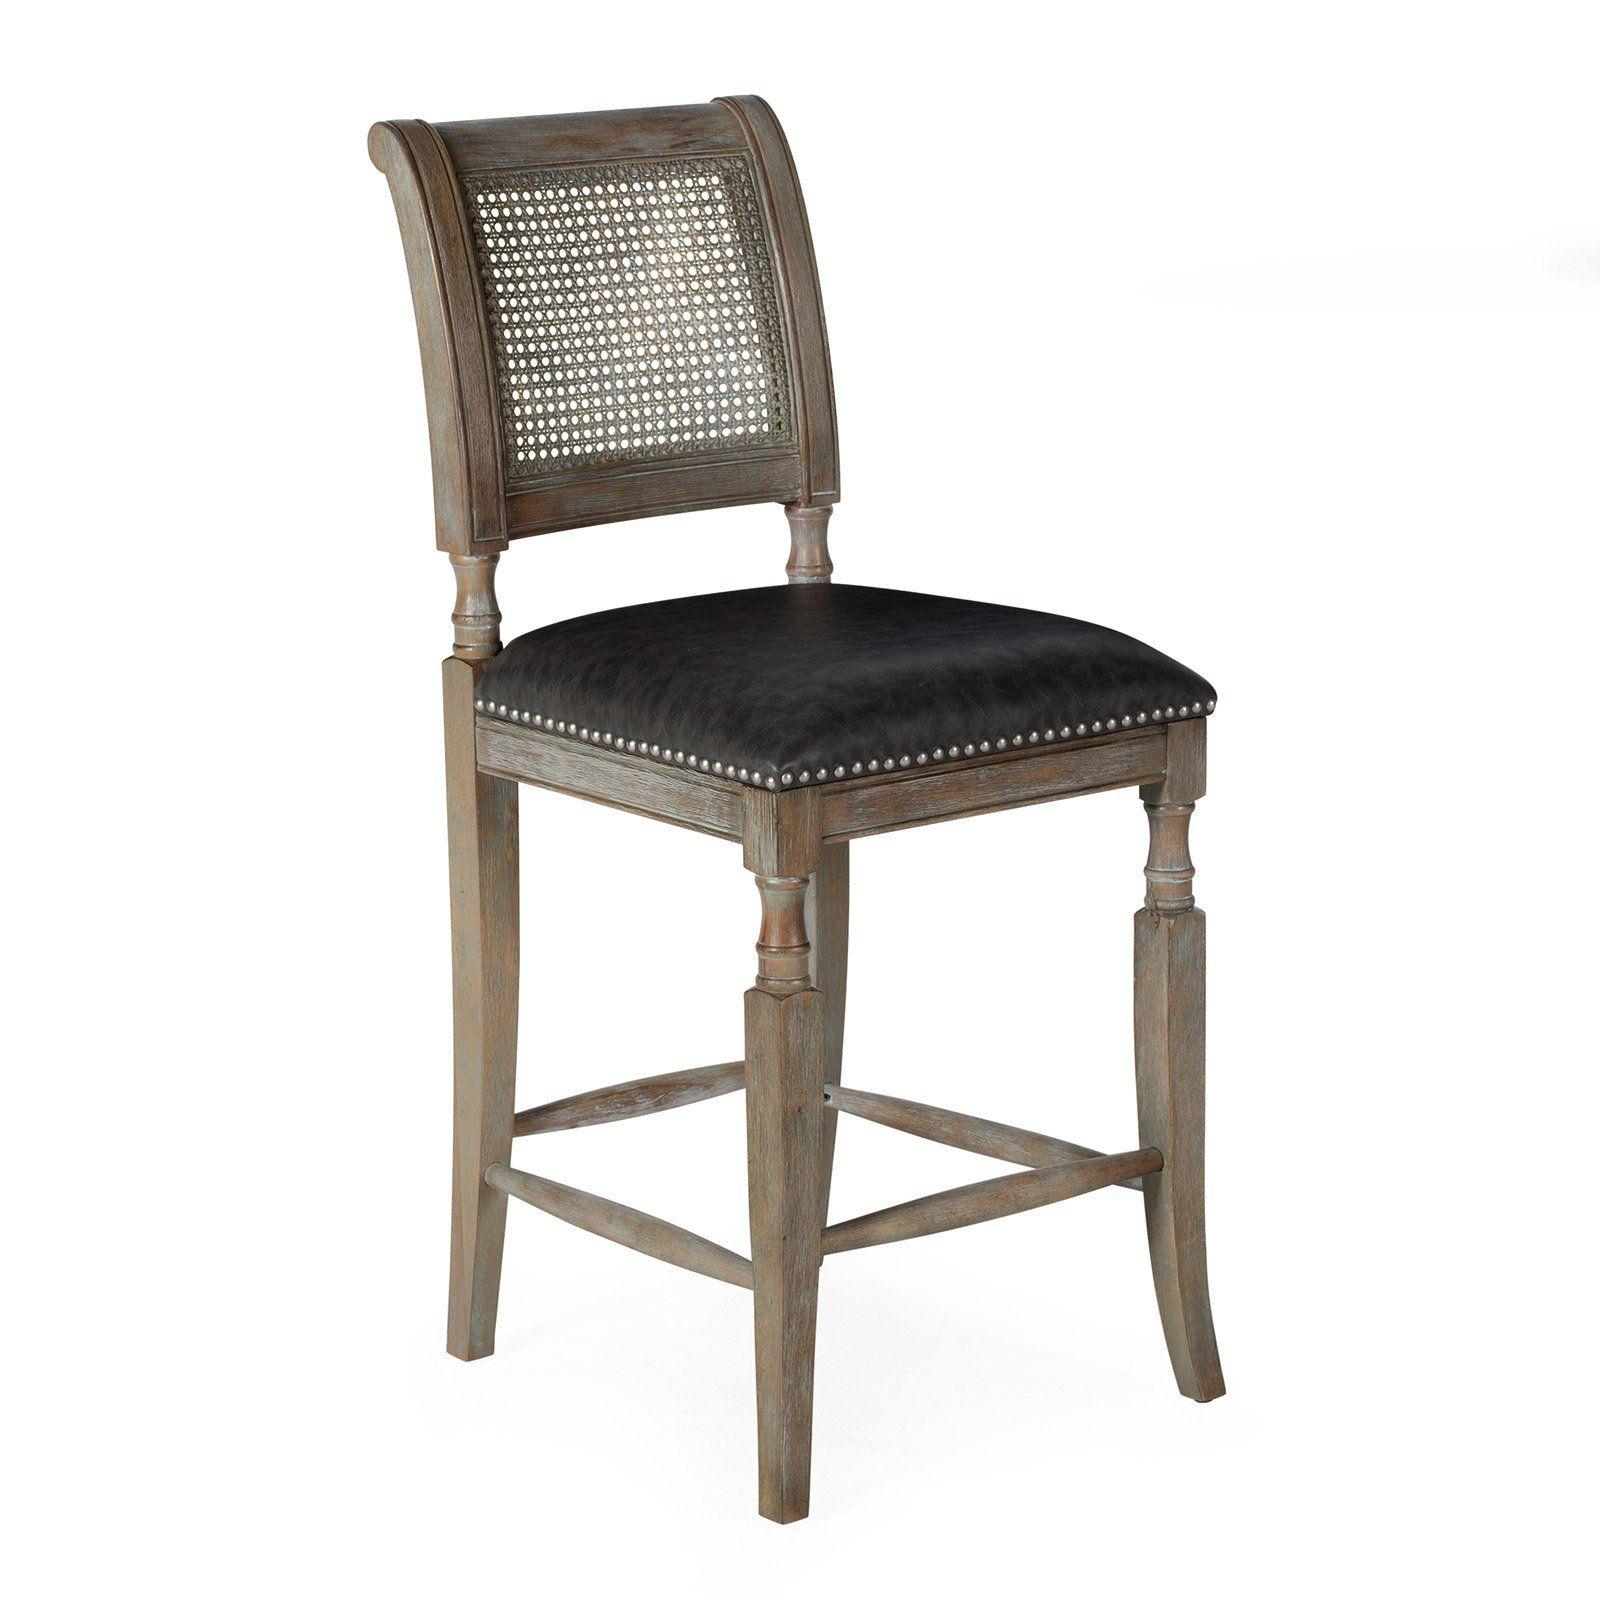 Astounding Belham Living 26 In Preston Cane Back Counter Stool Gray In Unemploymentrelief Wooden Chair Designs For Living Room Unemploymentrelieforg